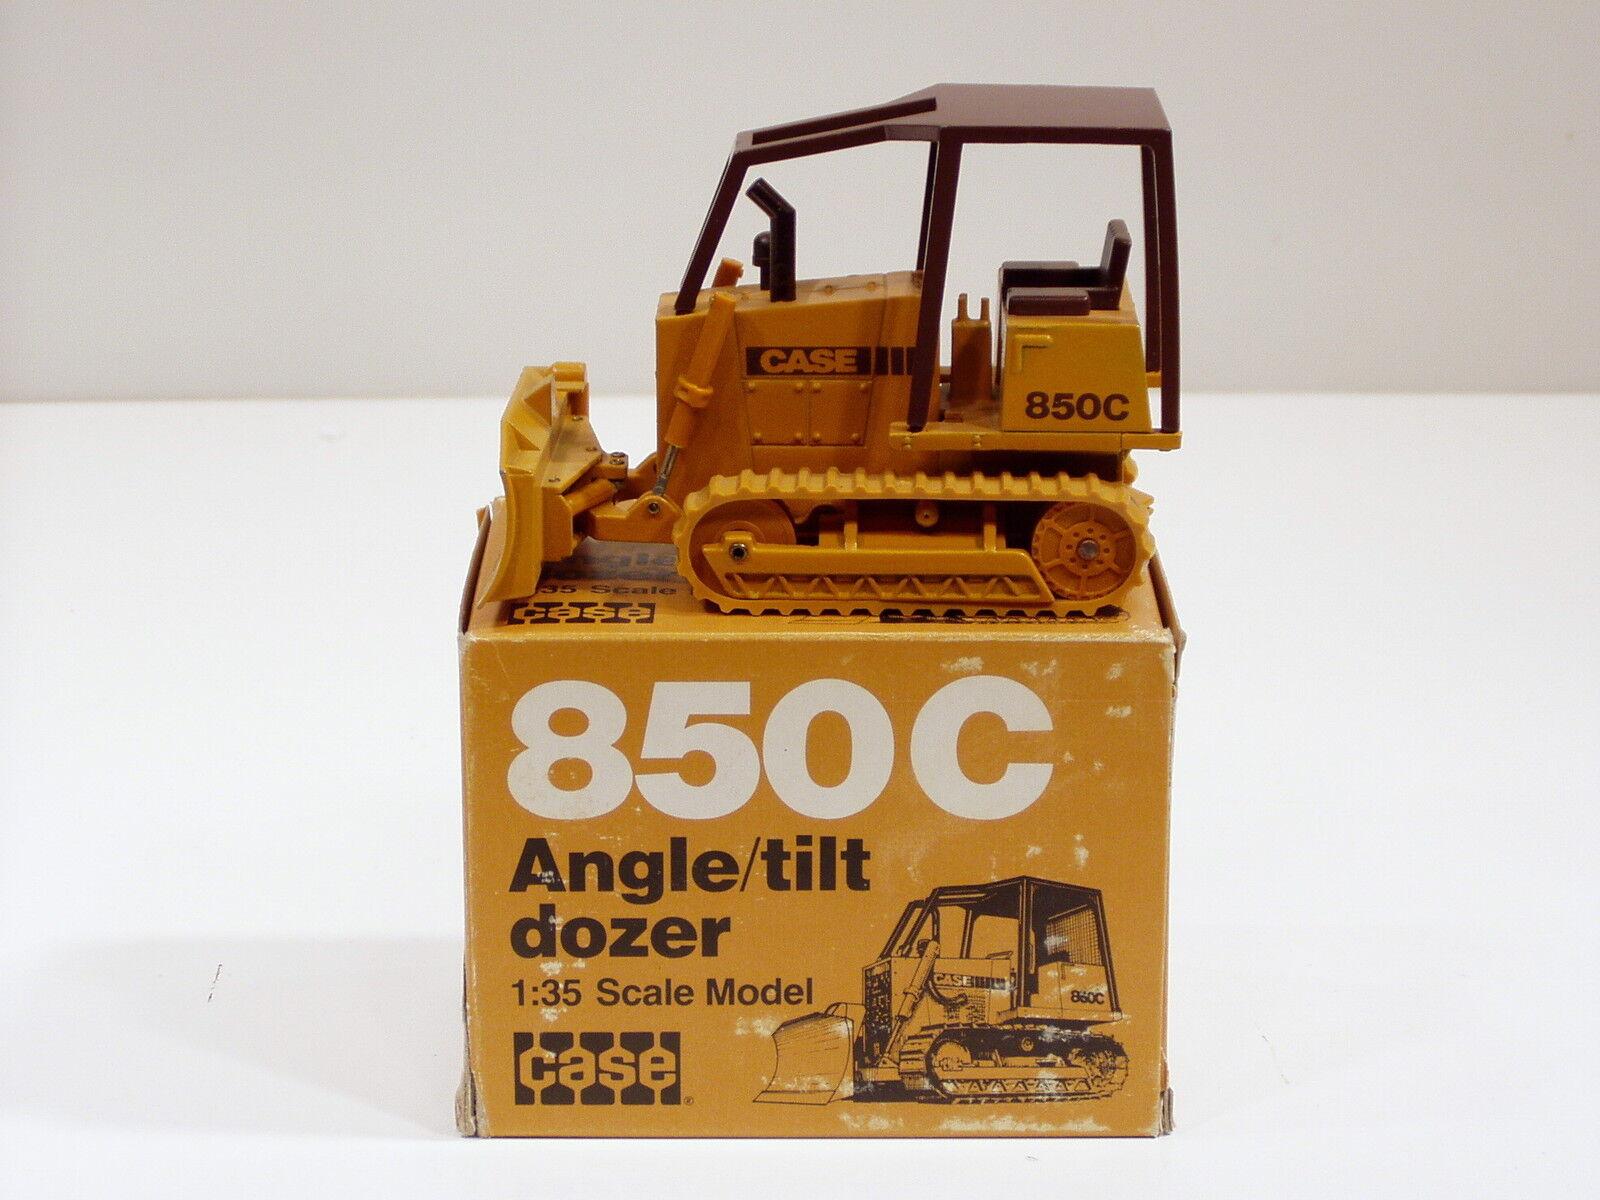 Case 850C Dozer - 1 35 - NZG  176 - MIB